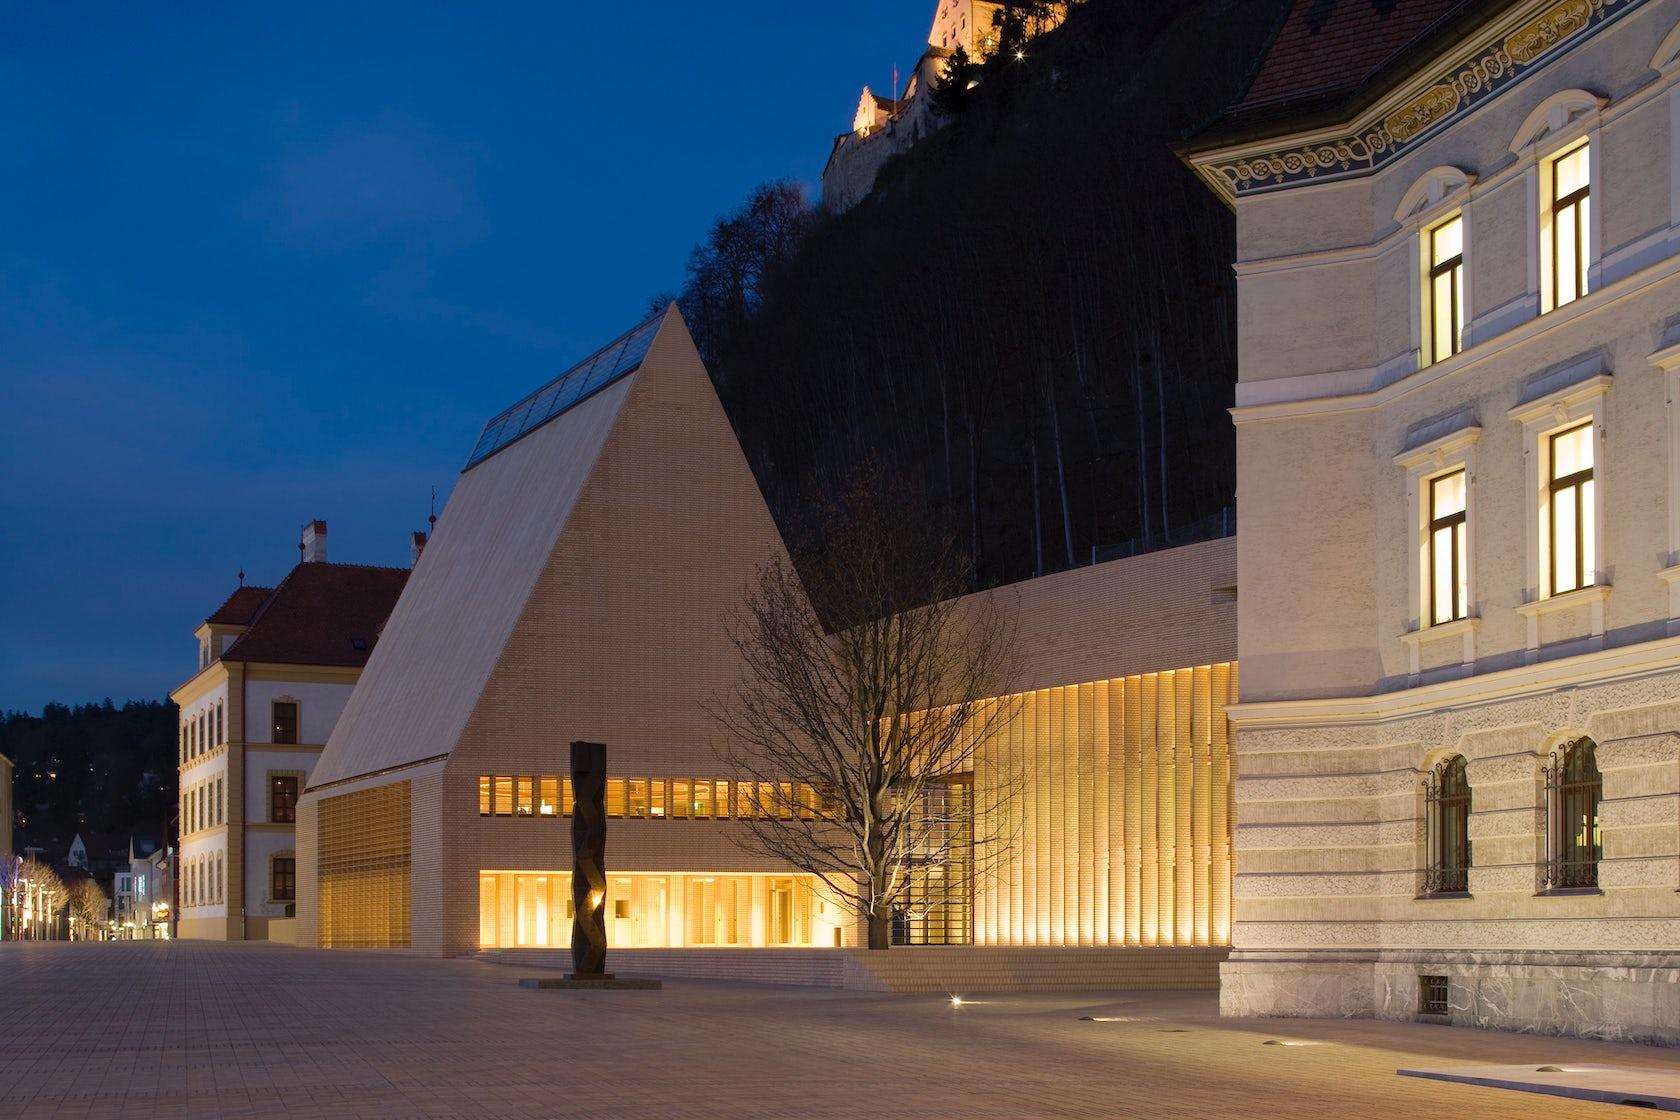 Parliament Building For The Principality Of Liechtenstein